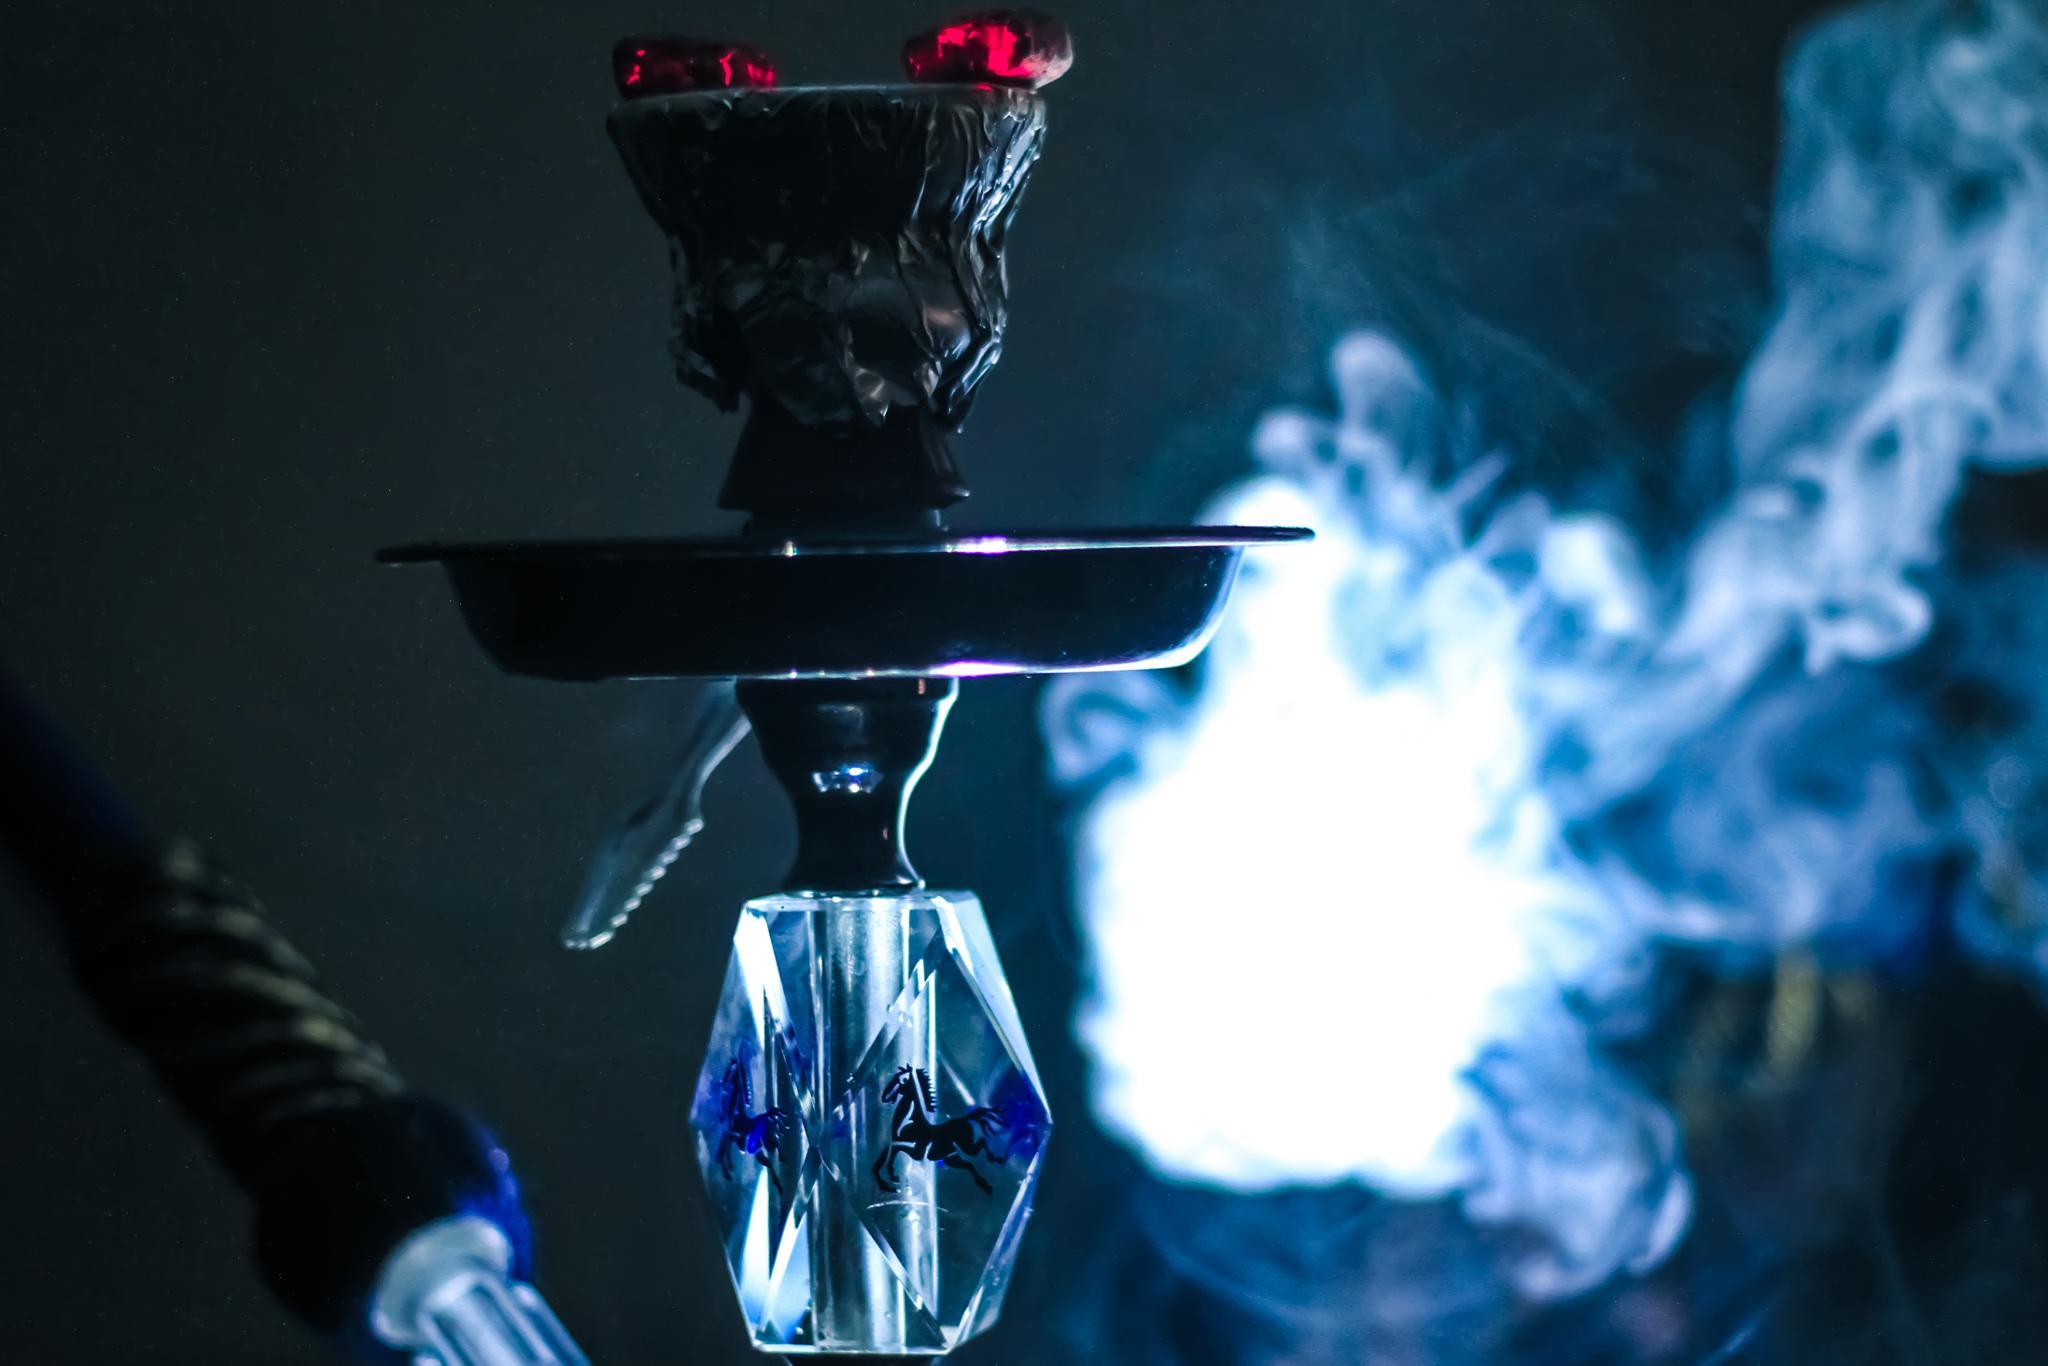 Shesha smoke by danish.khanxada